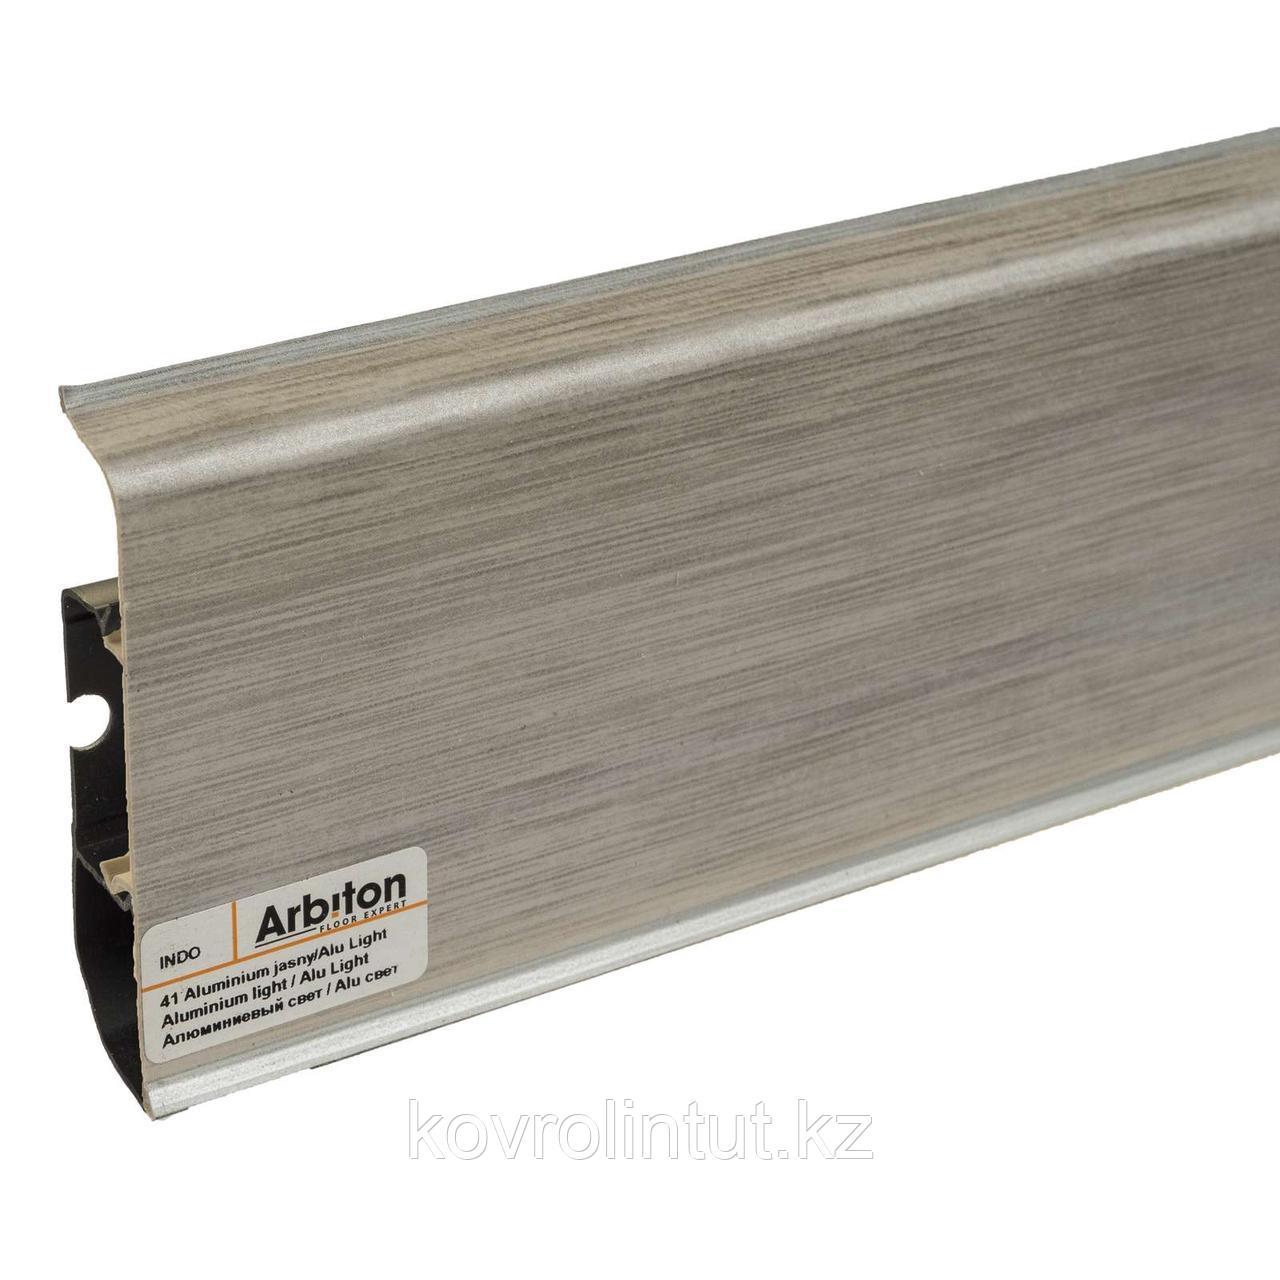 Плинтус Arbiton Indo 41, Алюминий Светлый, 2500х70х26 мм